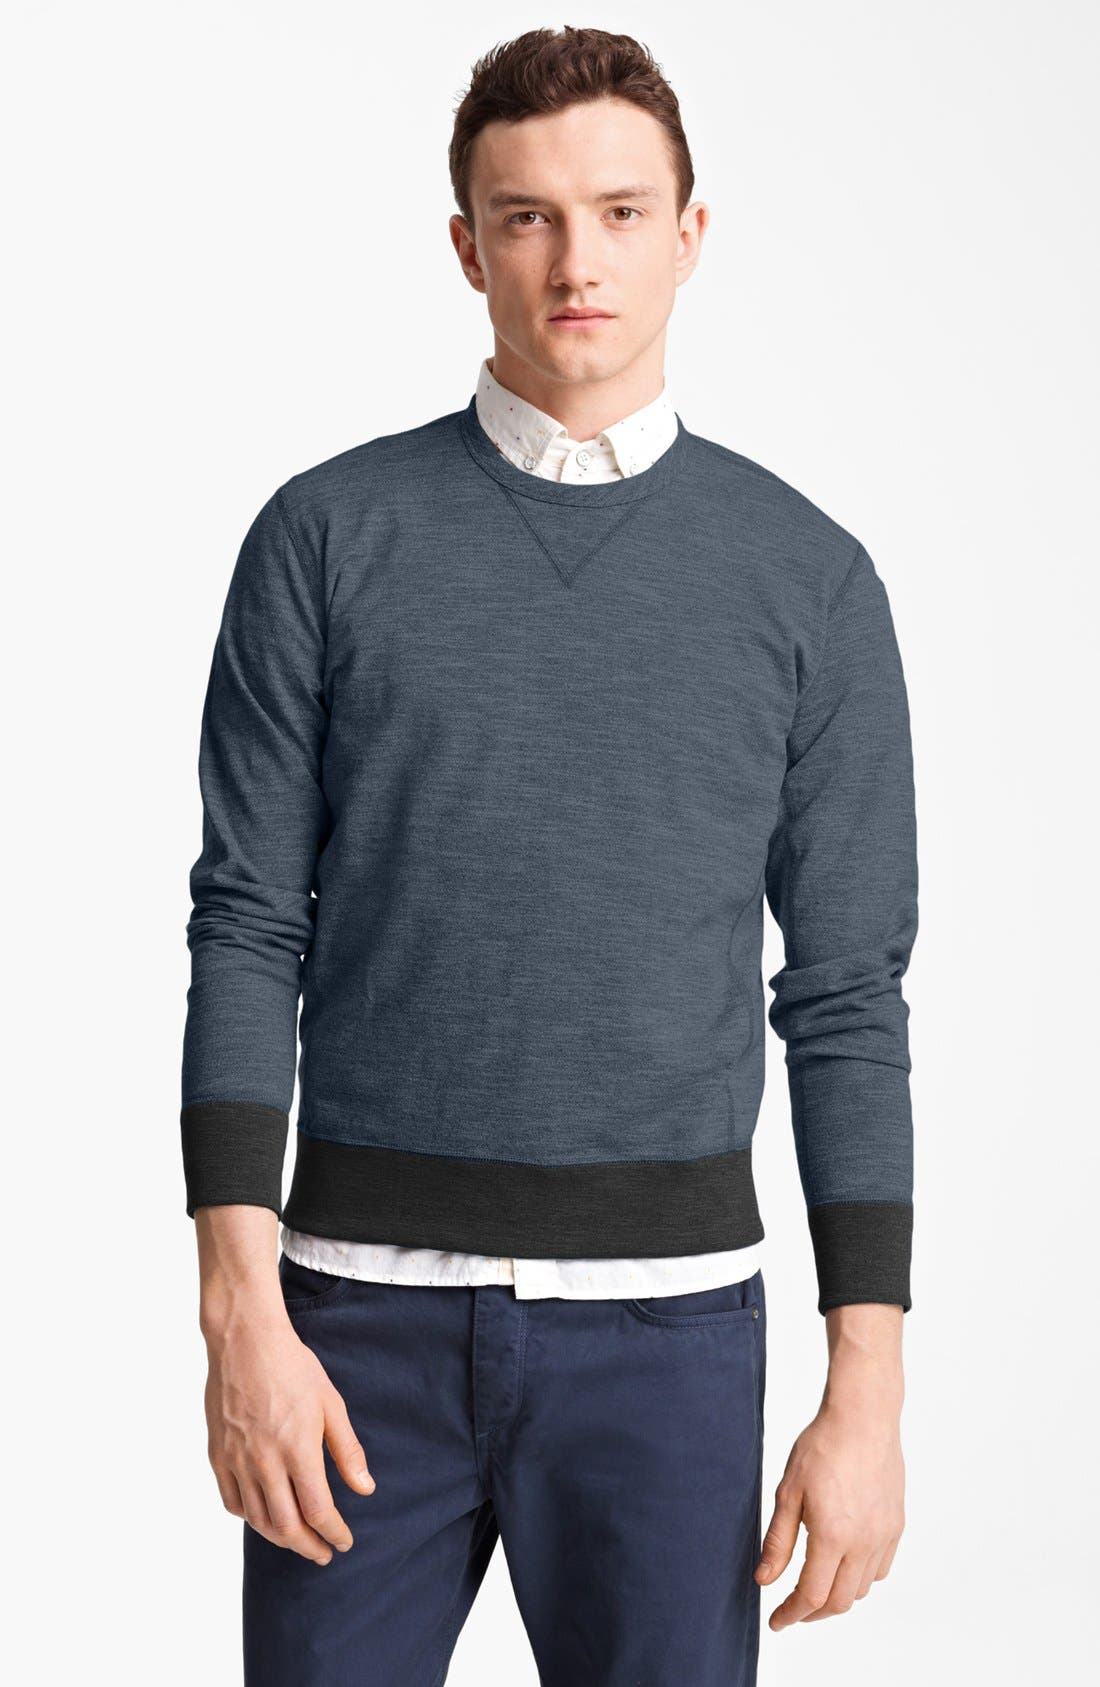 Main Image - rag & bone 'Moulinex' Crewneck Sweatshirt